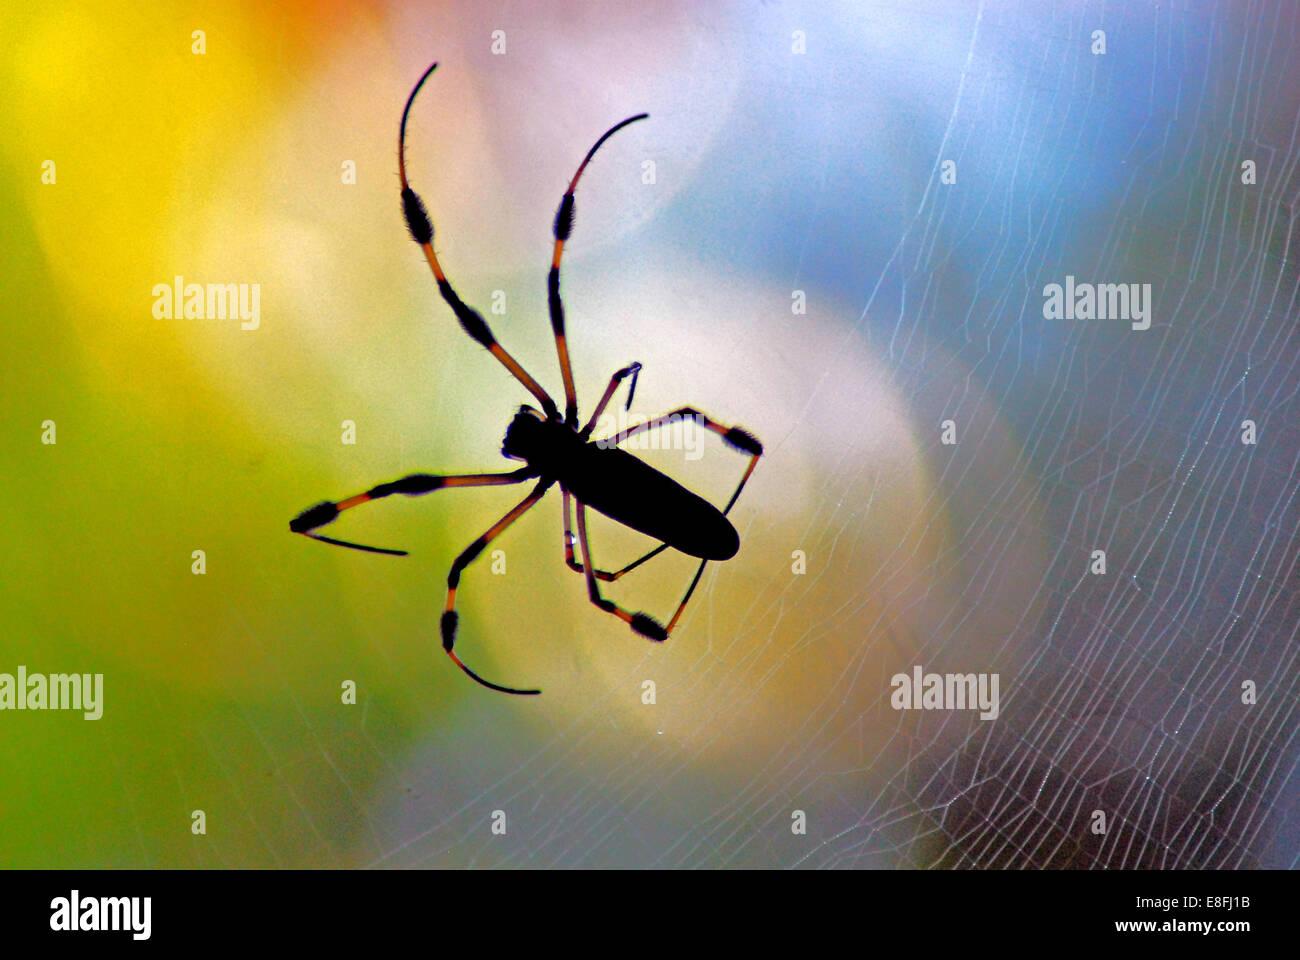 USA, Florida, Orange County, Orlando, Golden Orb Spider - Stock Image